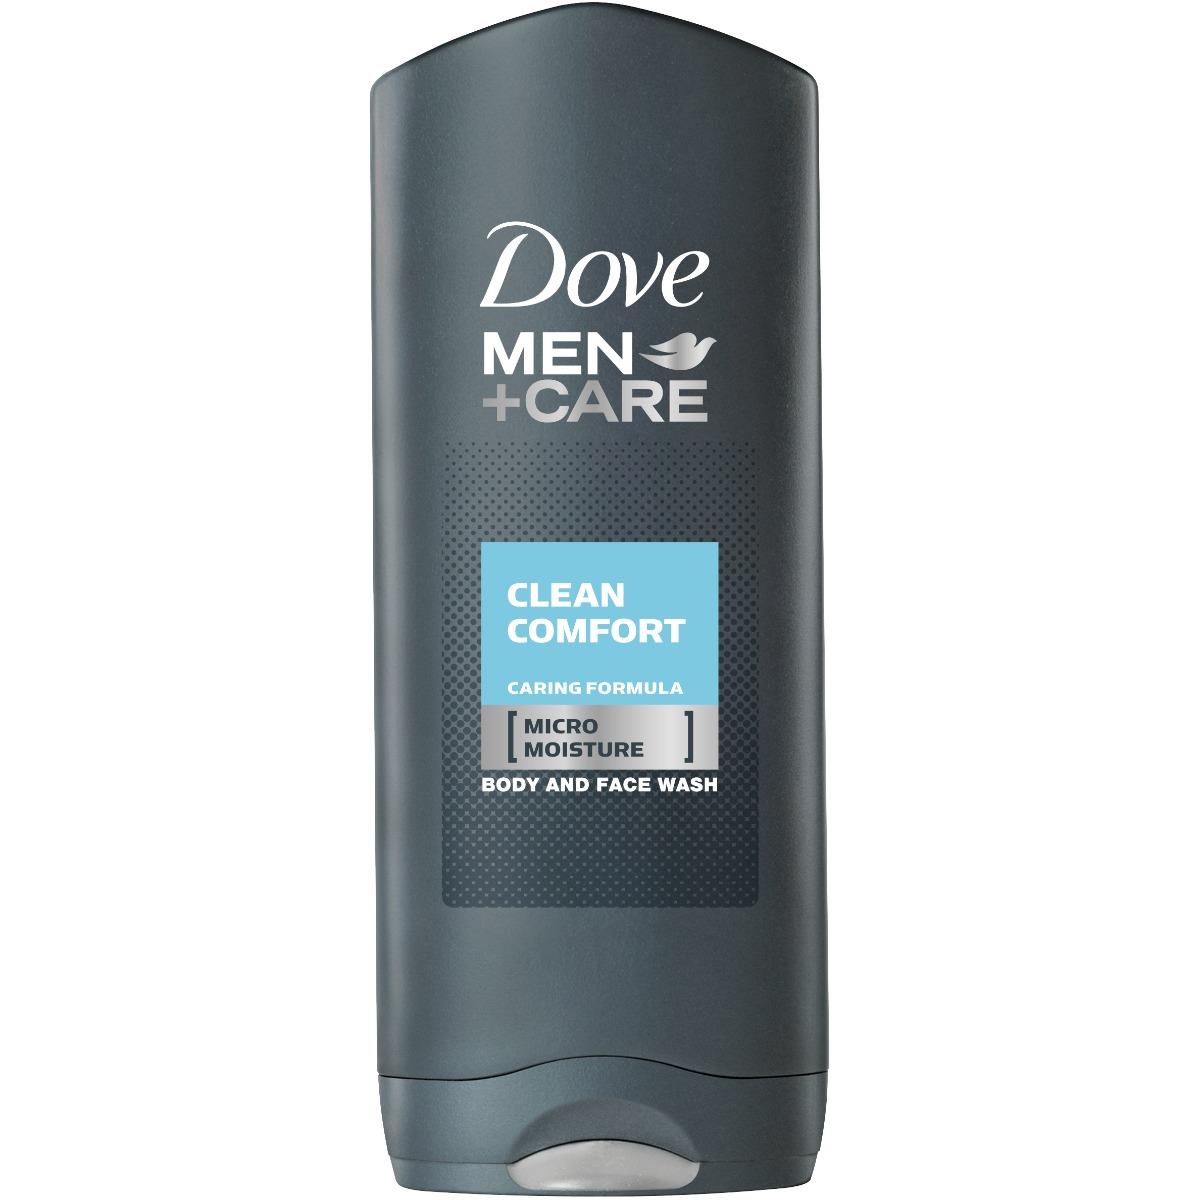 Gel de dus Dove Men +Care Clean Comfort, 400 ml imagine